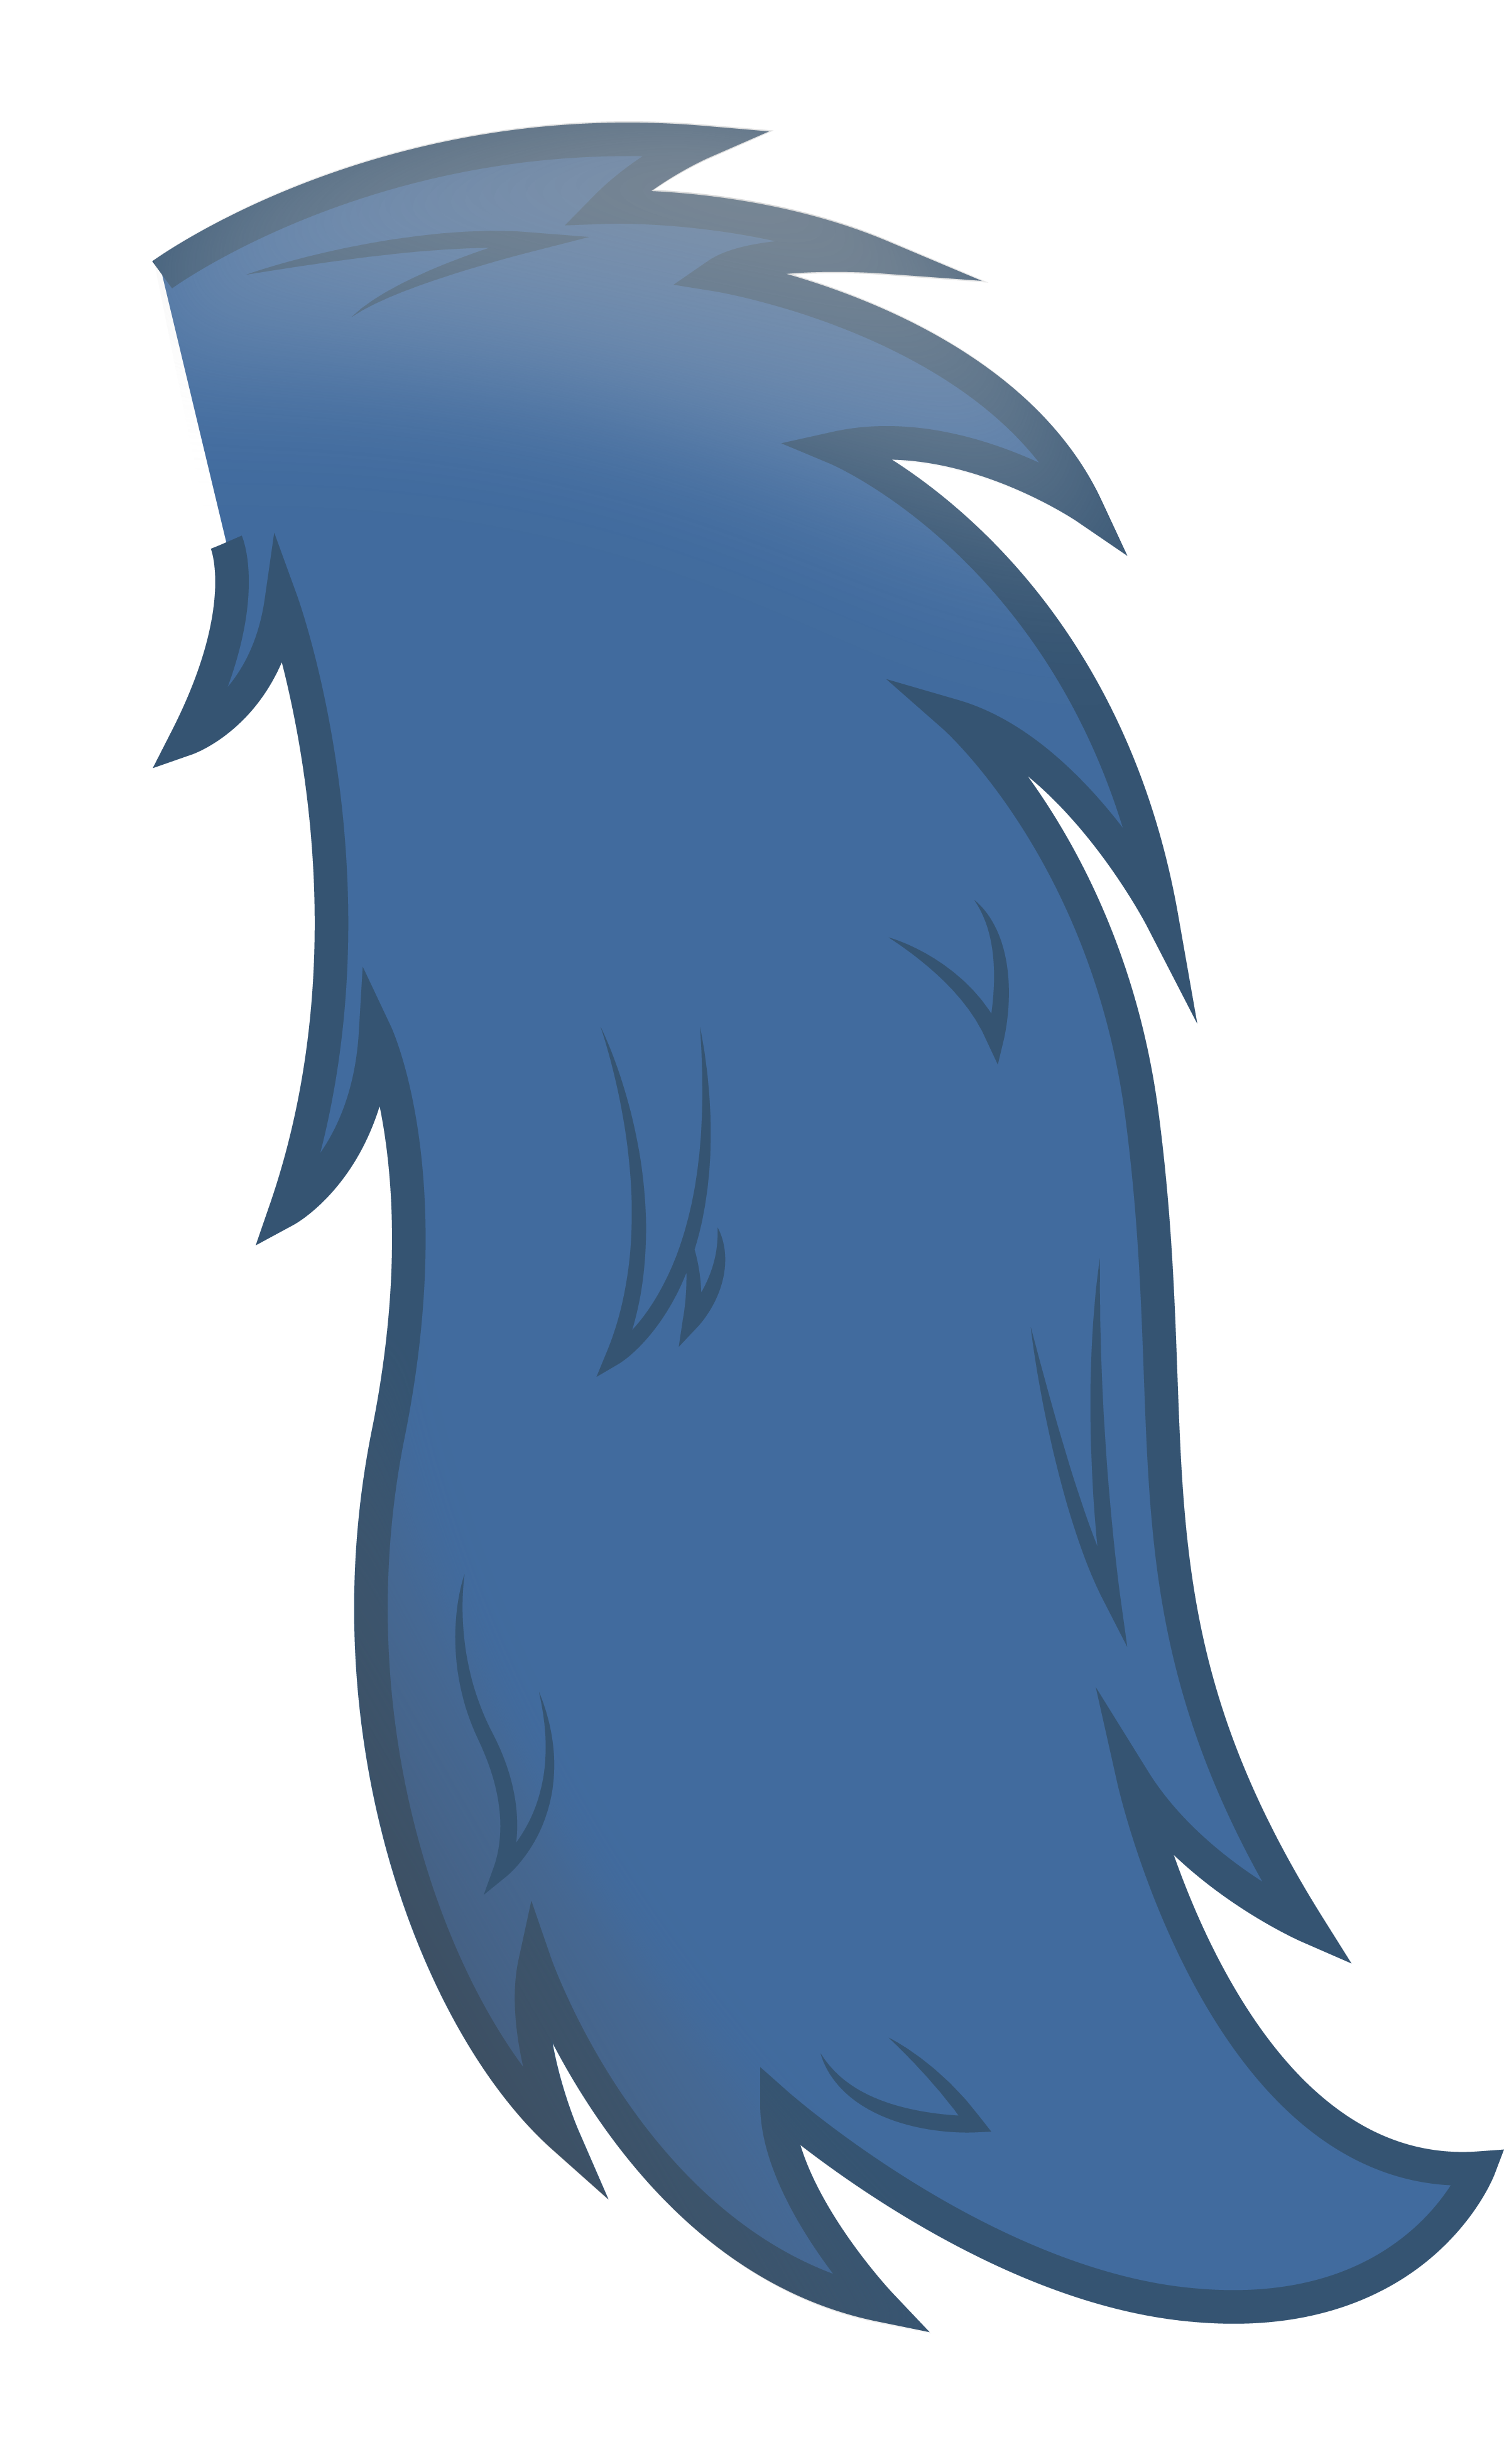 fluffy tail by Swivel-Zimber